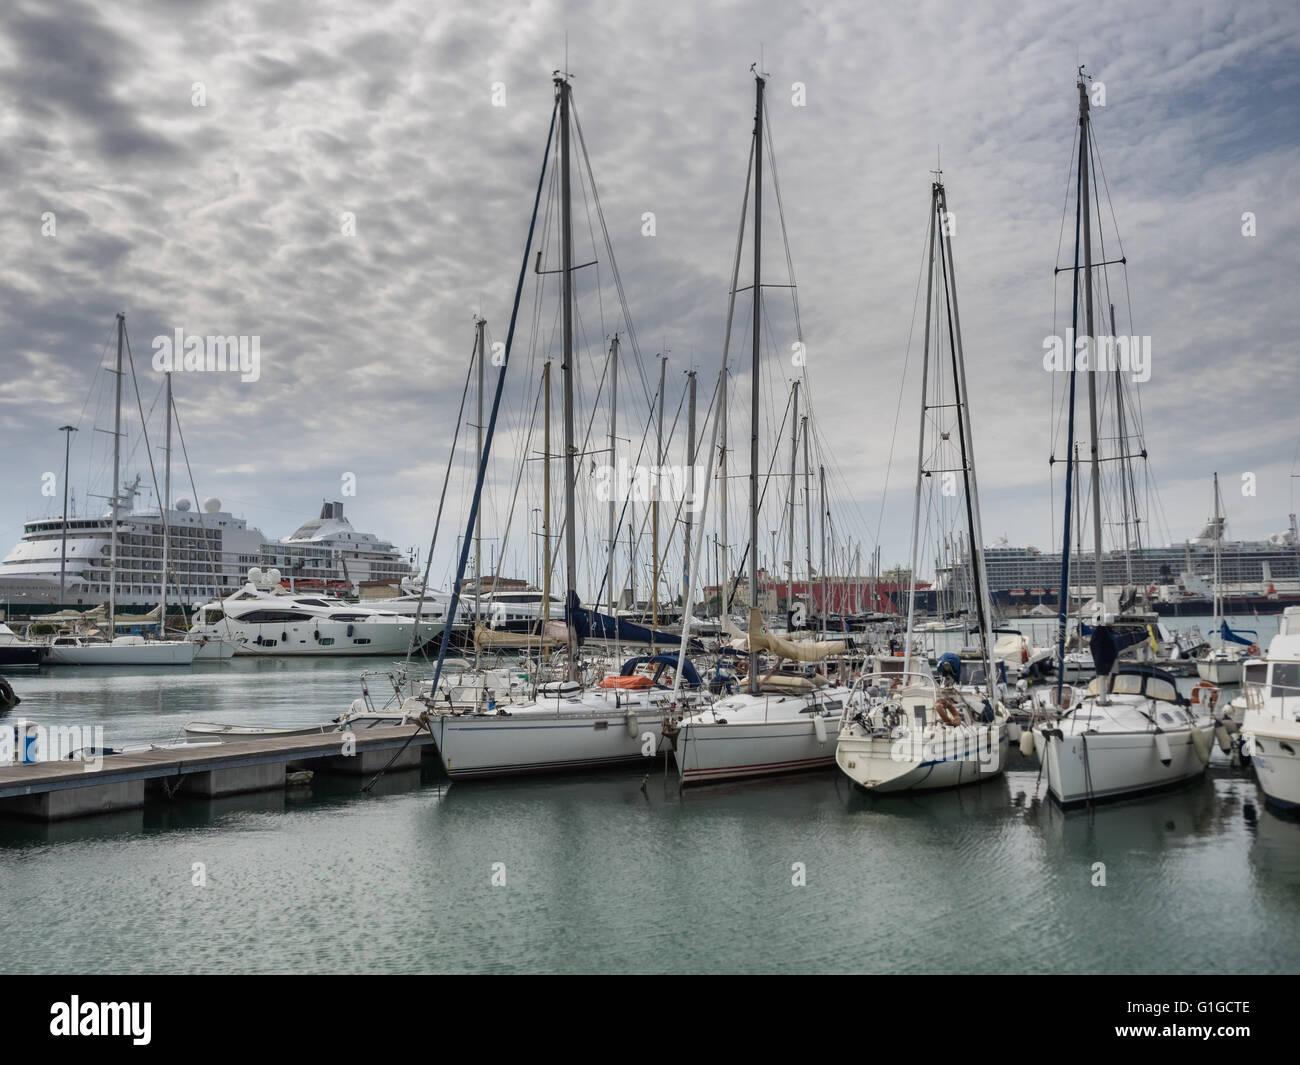 Yachts in the harbor of Livorno, Tuscany Italy - Stock Image